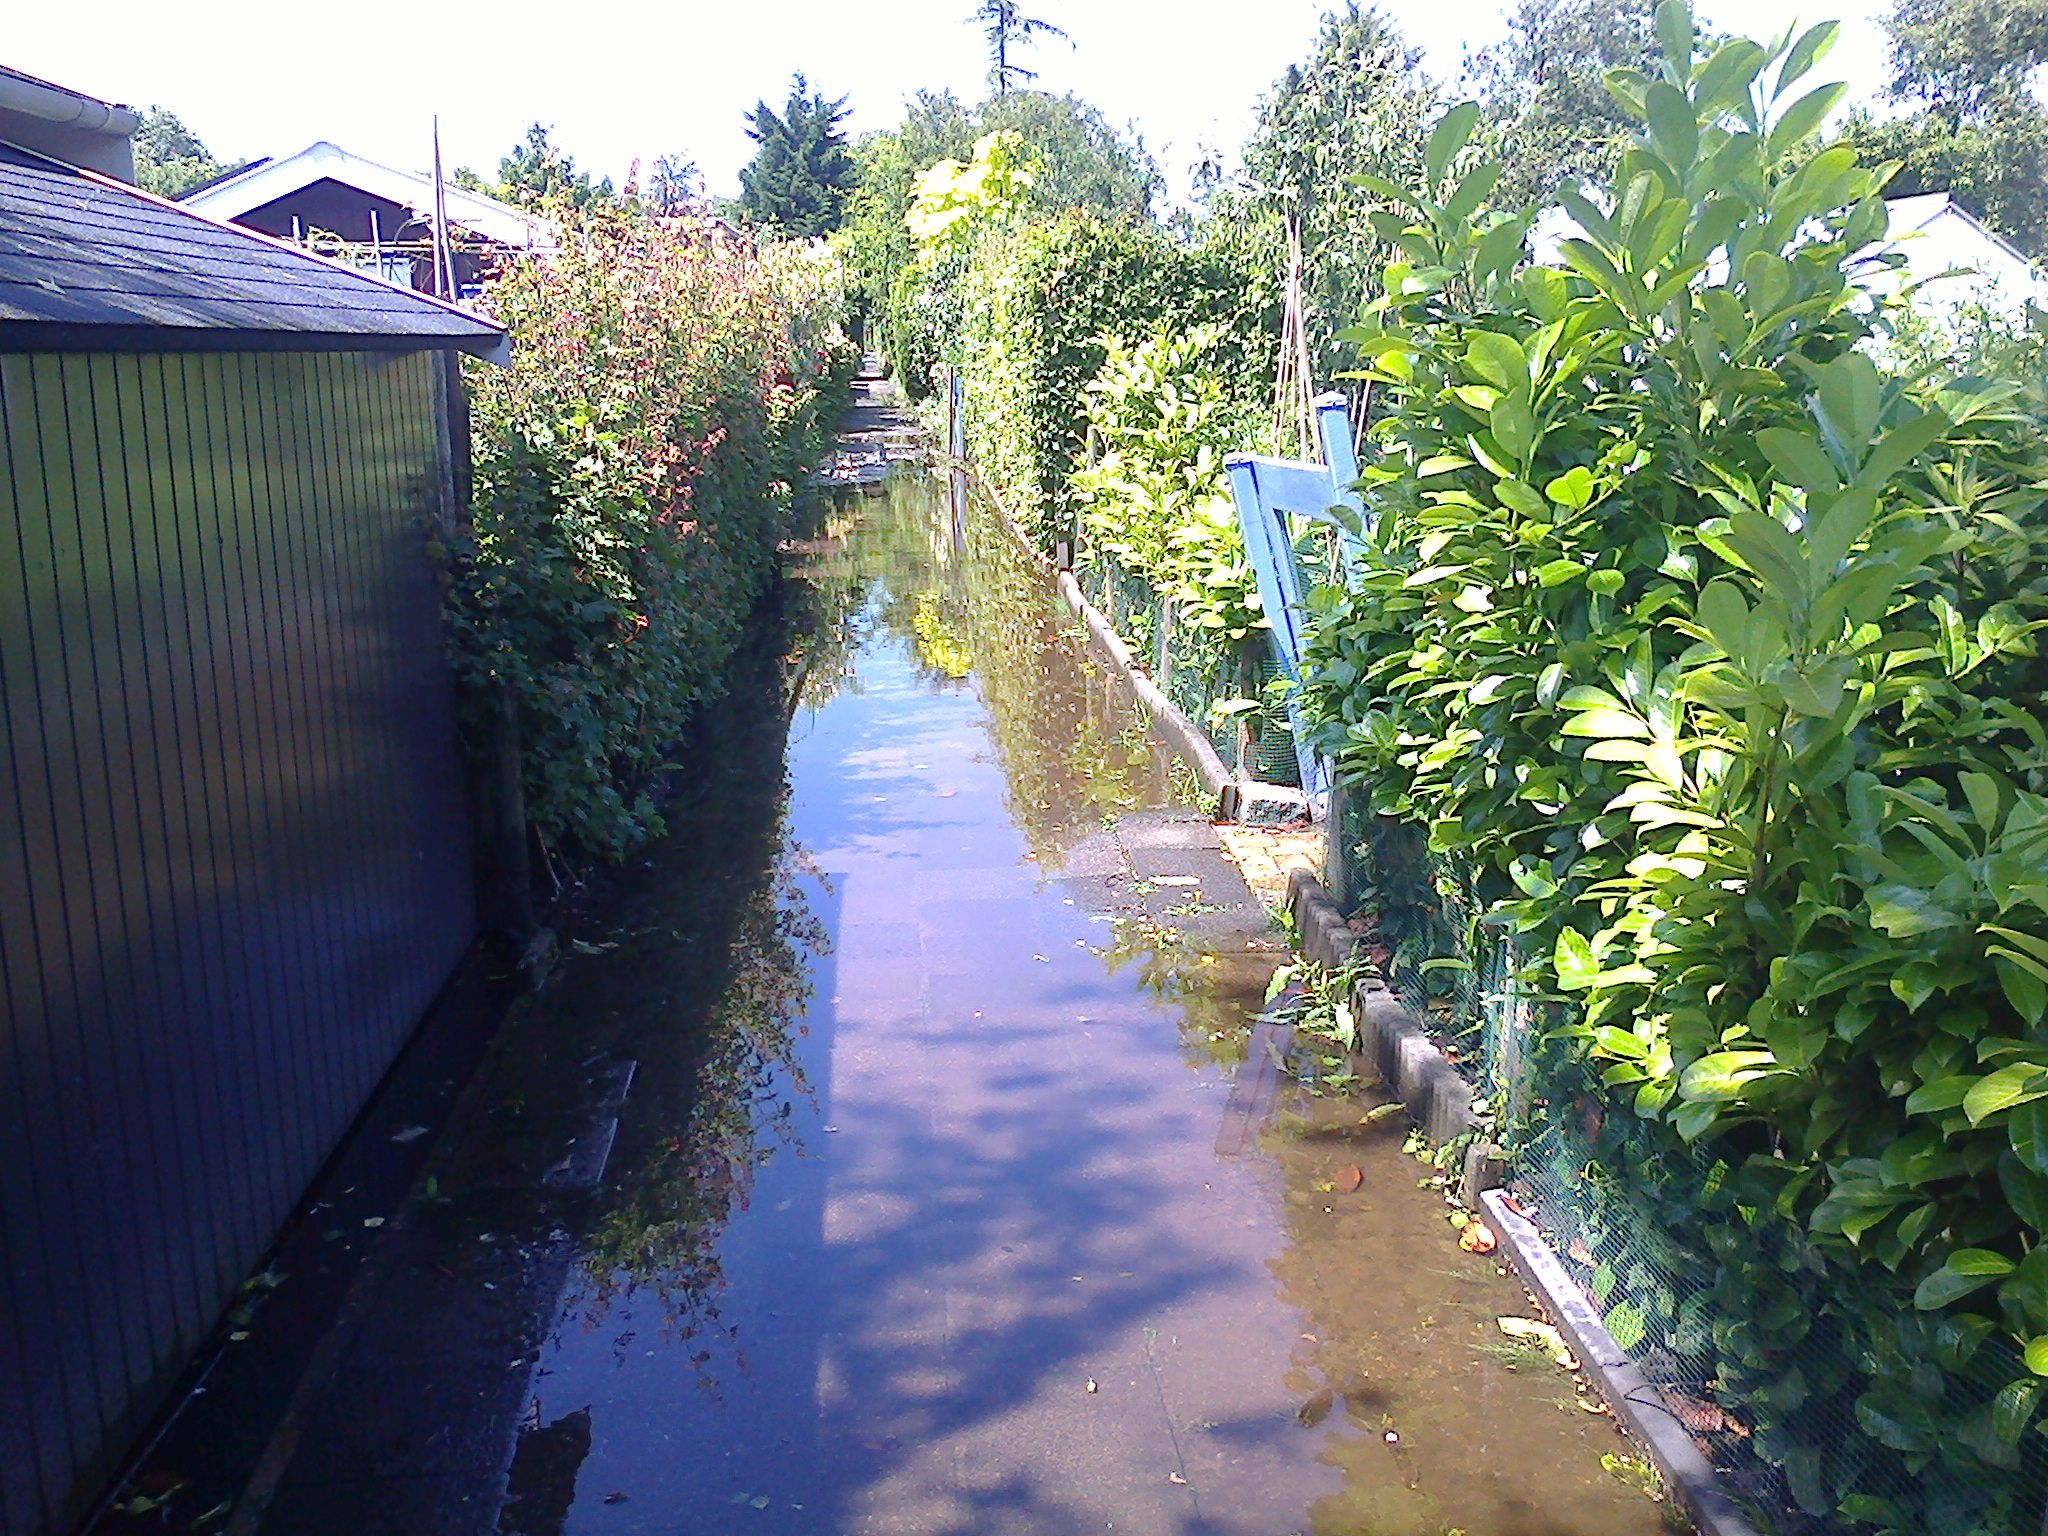 Verticale Drainage Tuin : Drainage aanleggen drainage tuin buitenlevengevoel